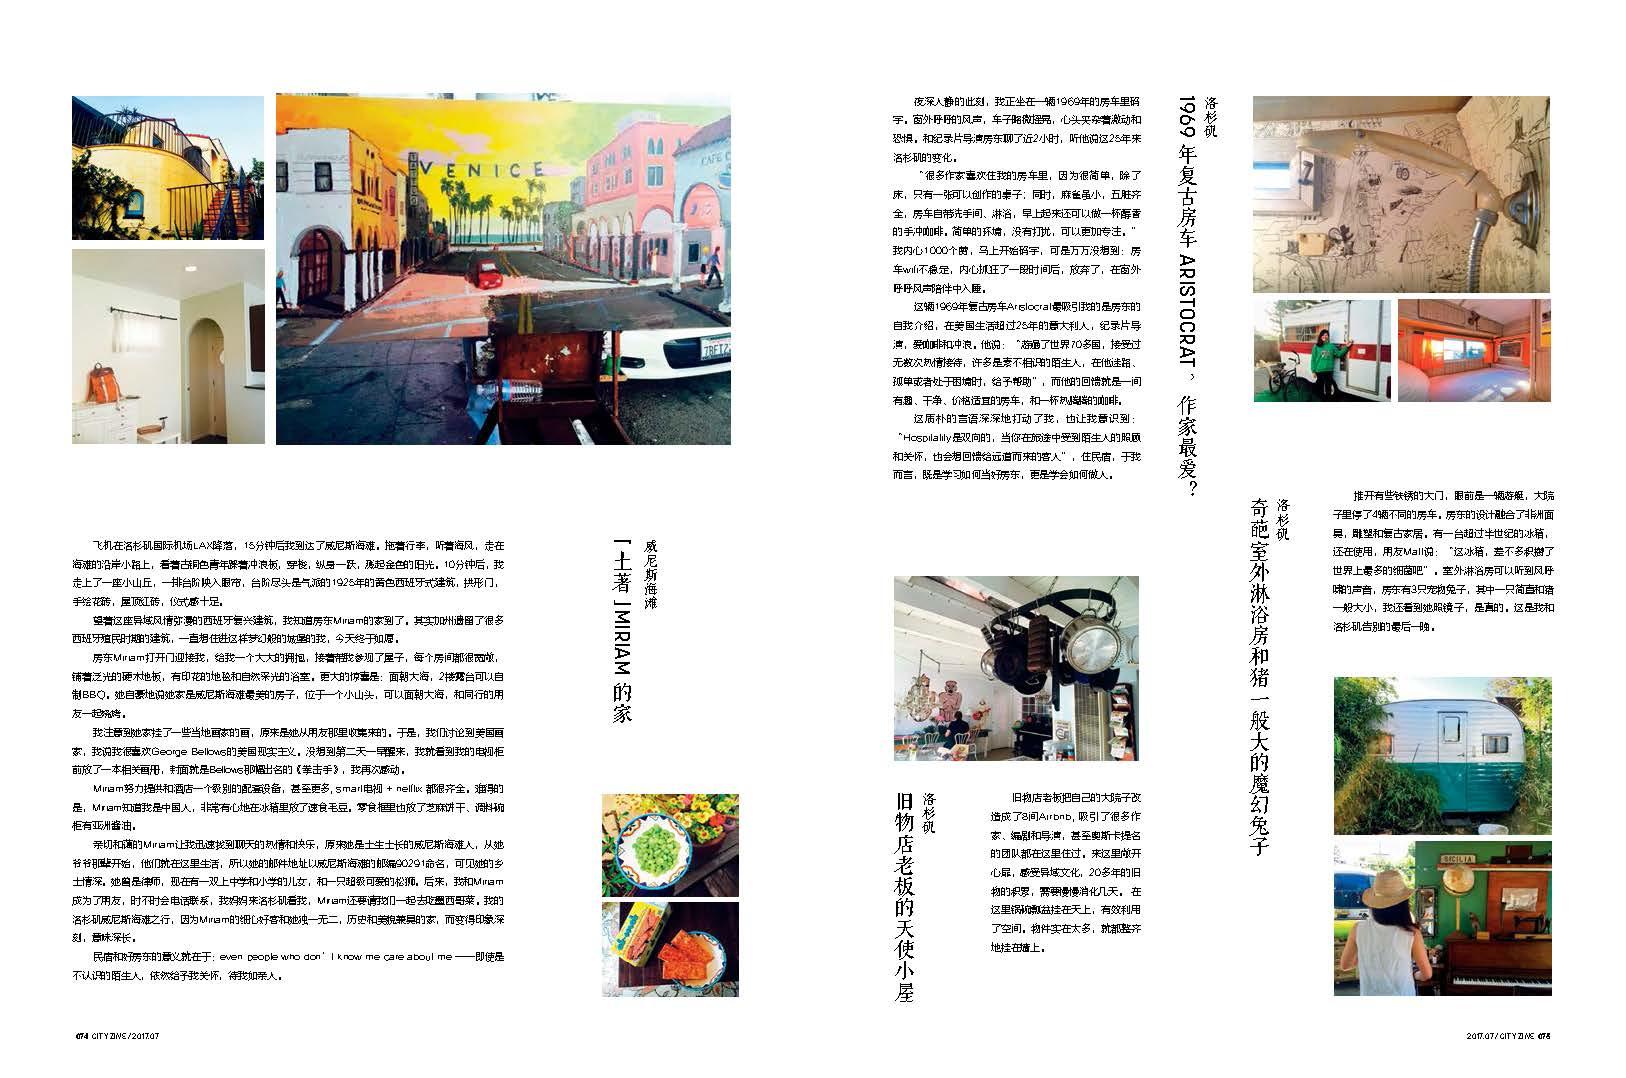 P64-83苹果02 CITYZINE final_Page_06.jpg